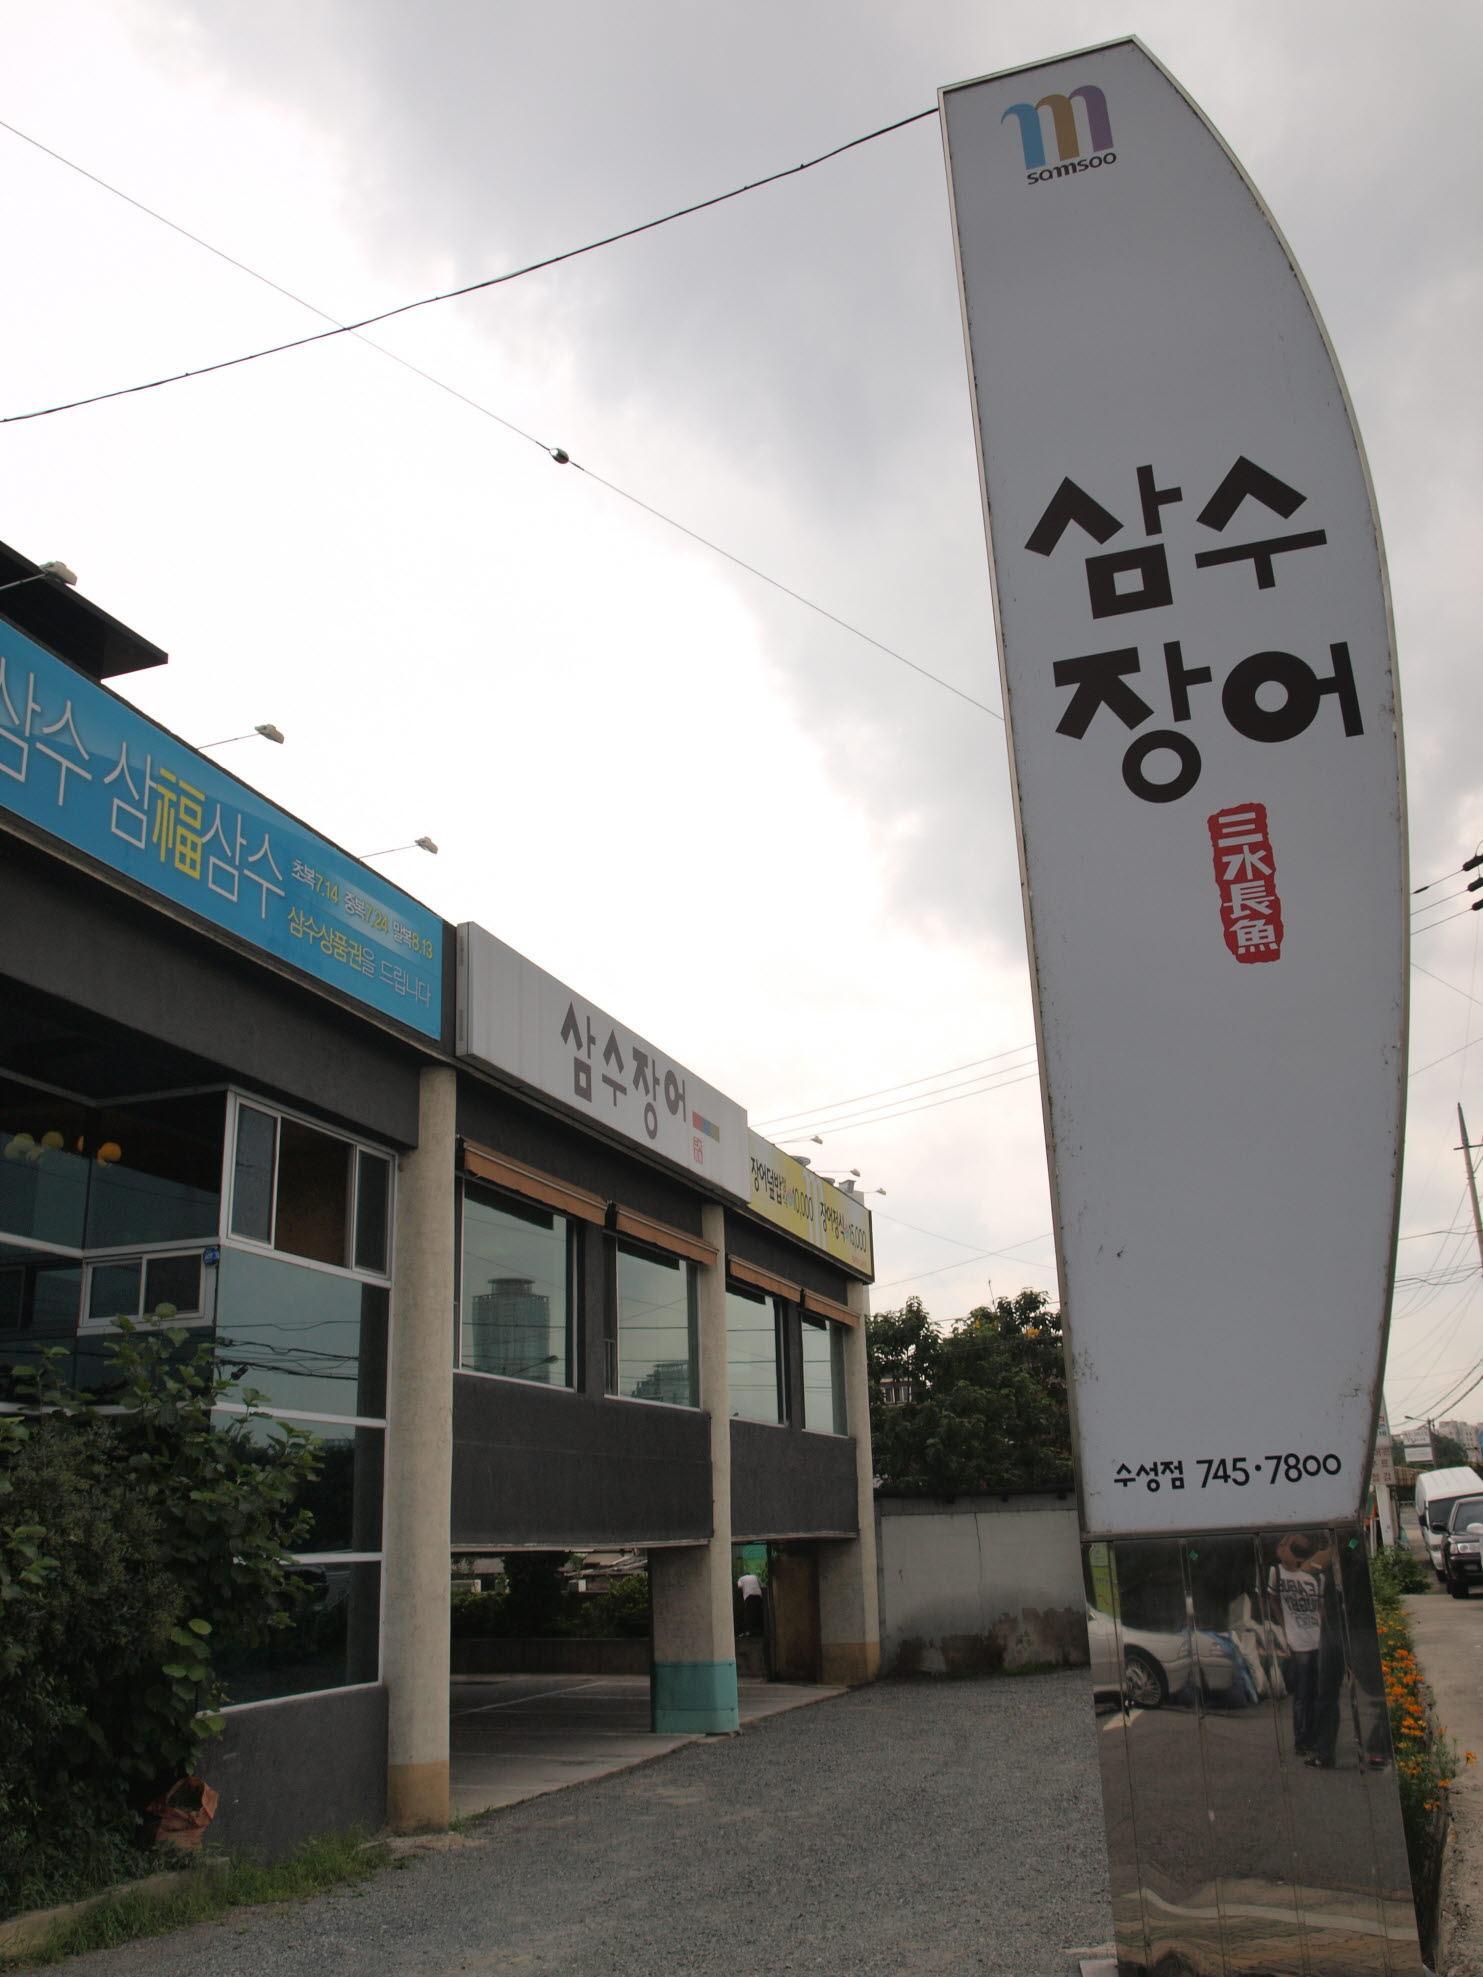 Samsu Jangeo (Eel) Restaurant (Suseong Subbranch)